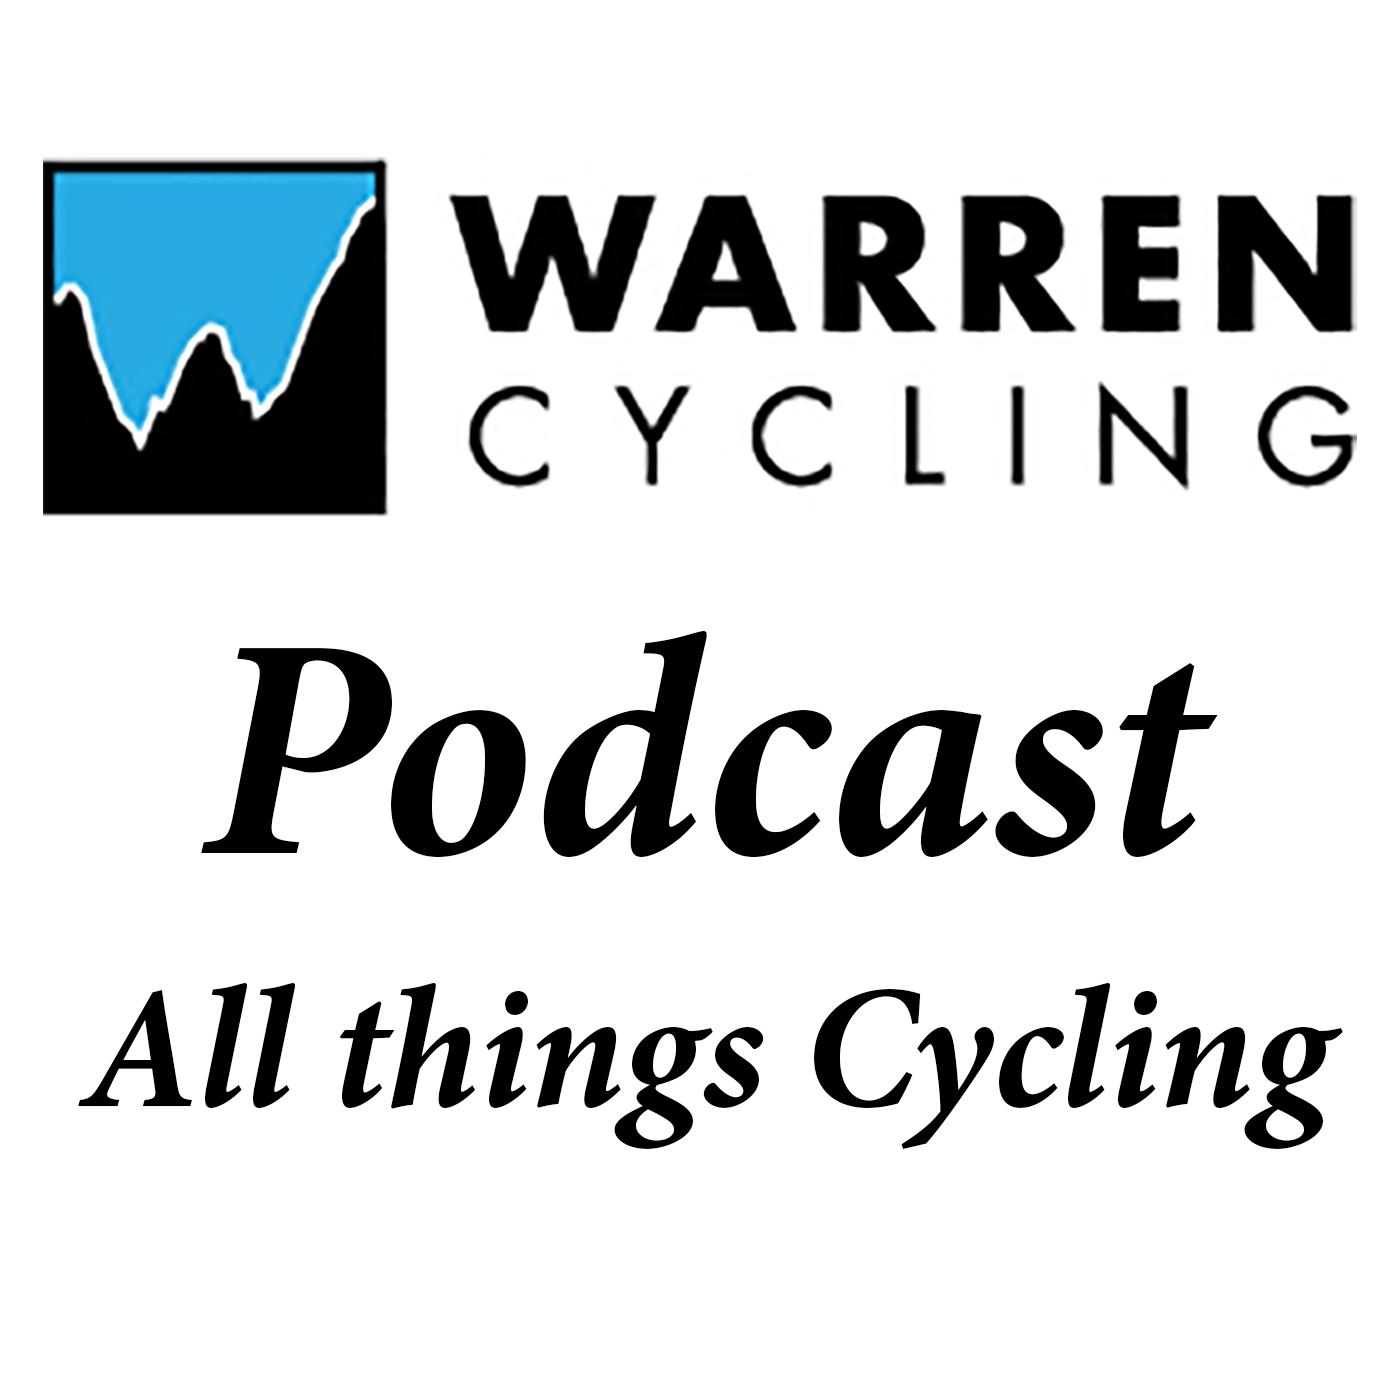 Warren Cycling Podcast Episode 265: End of the Road Season Recap show art